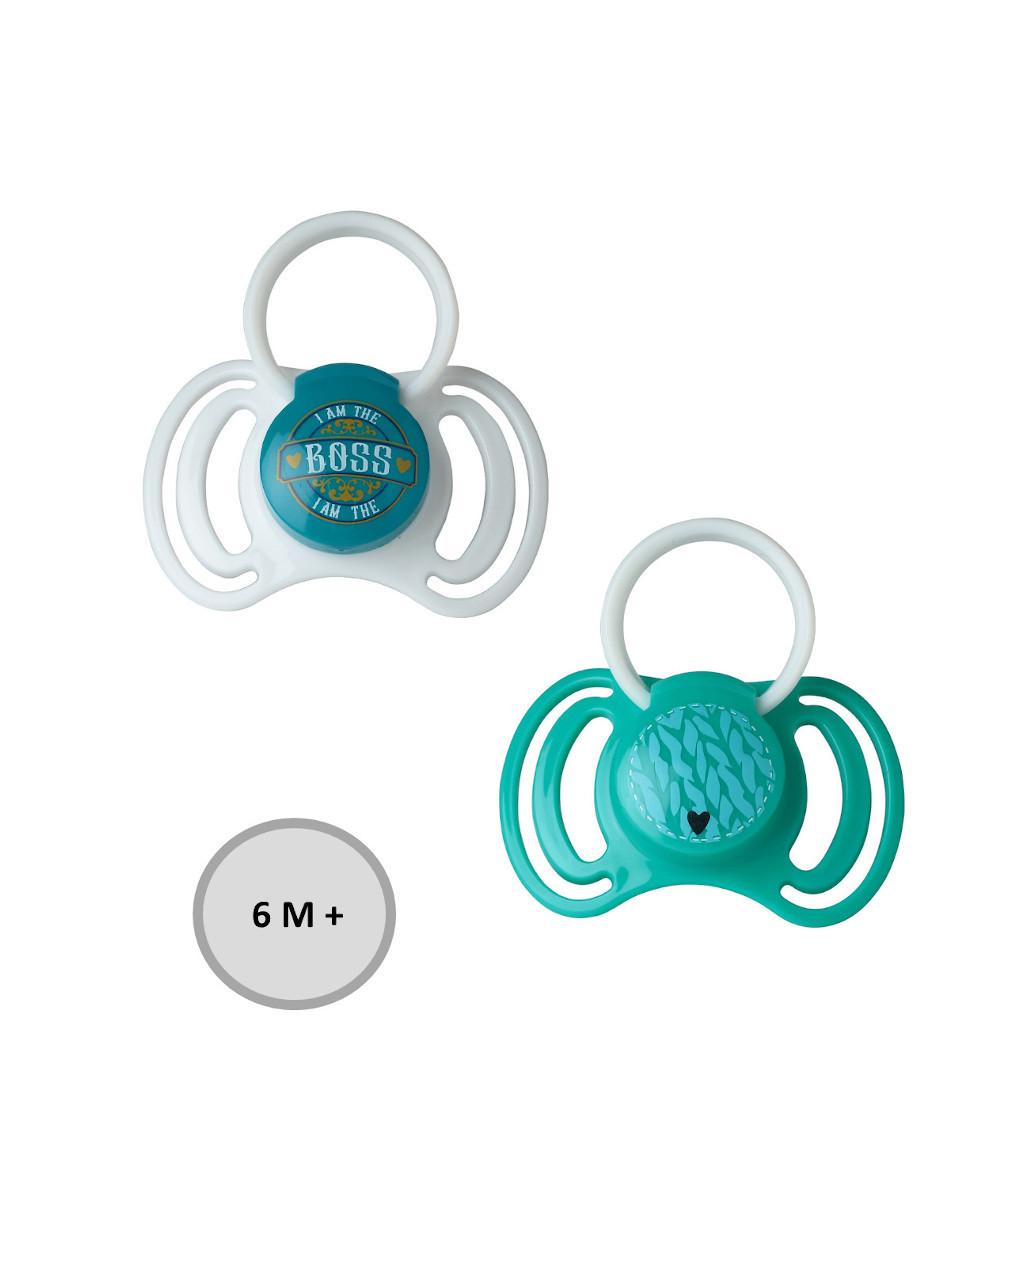 Chupetas de silicone com anel 6+ meses 2 pcs - That's Love